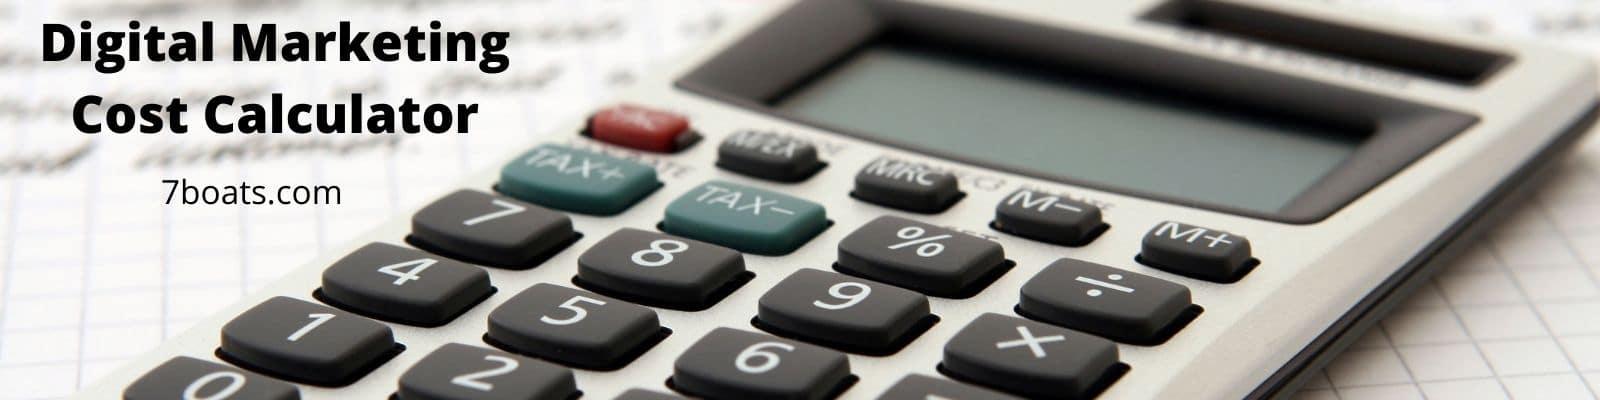 Digital Marketing Cost Calculator